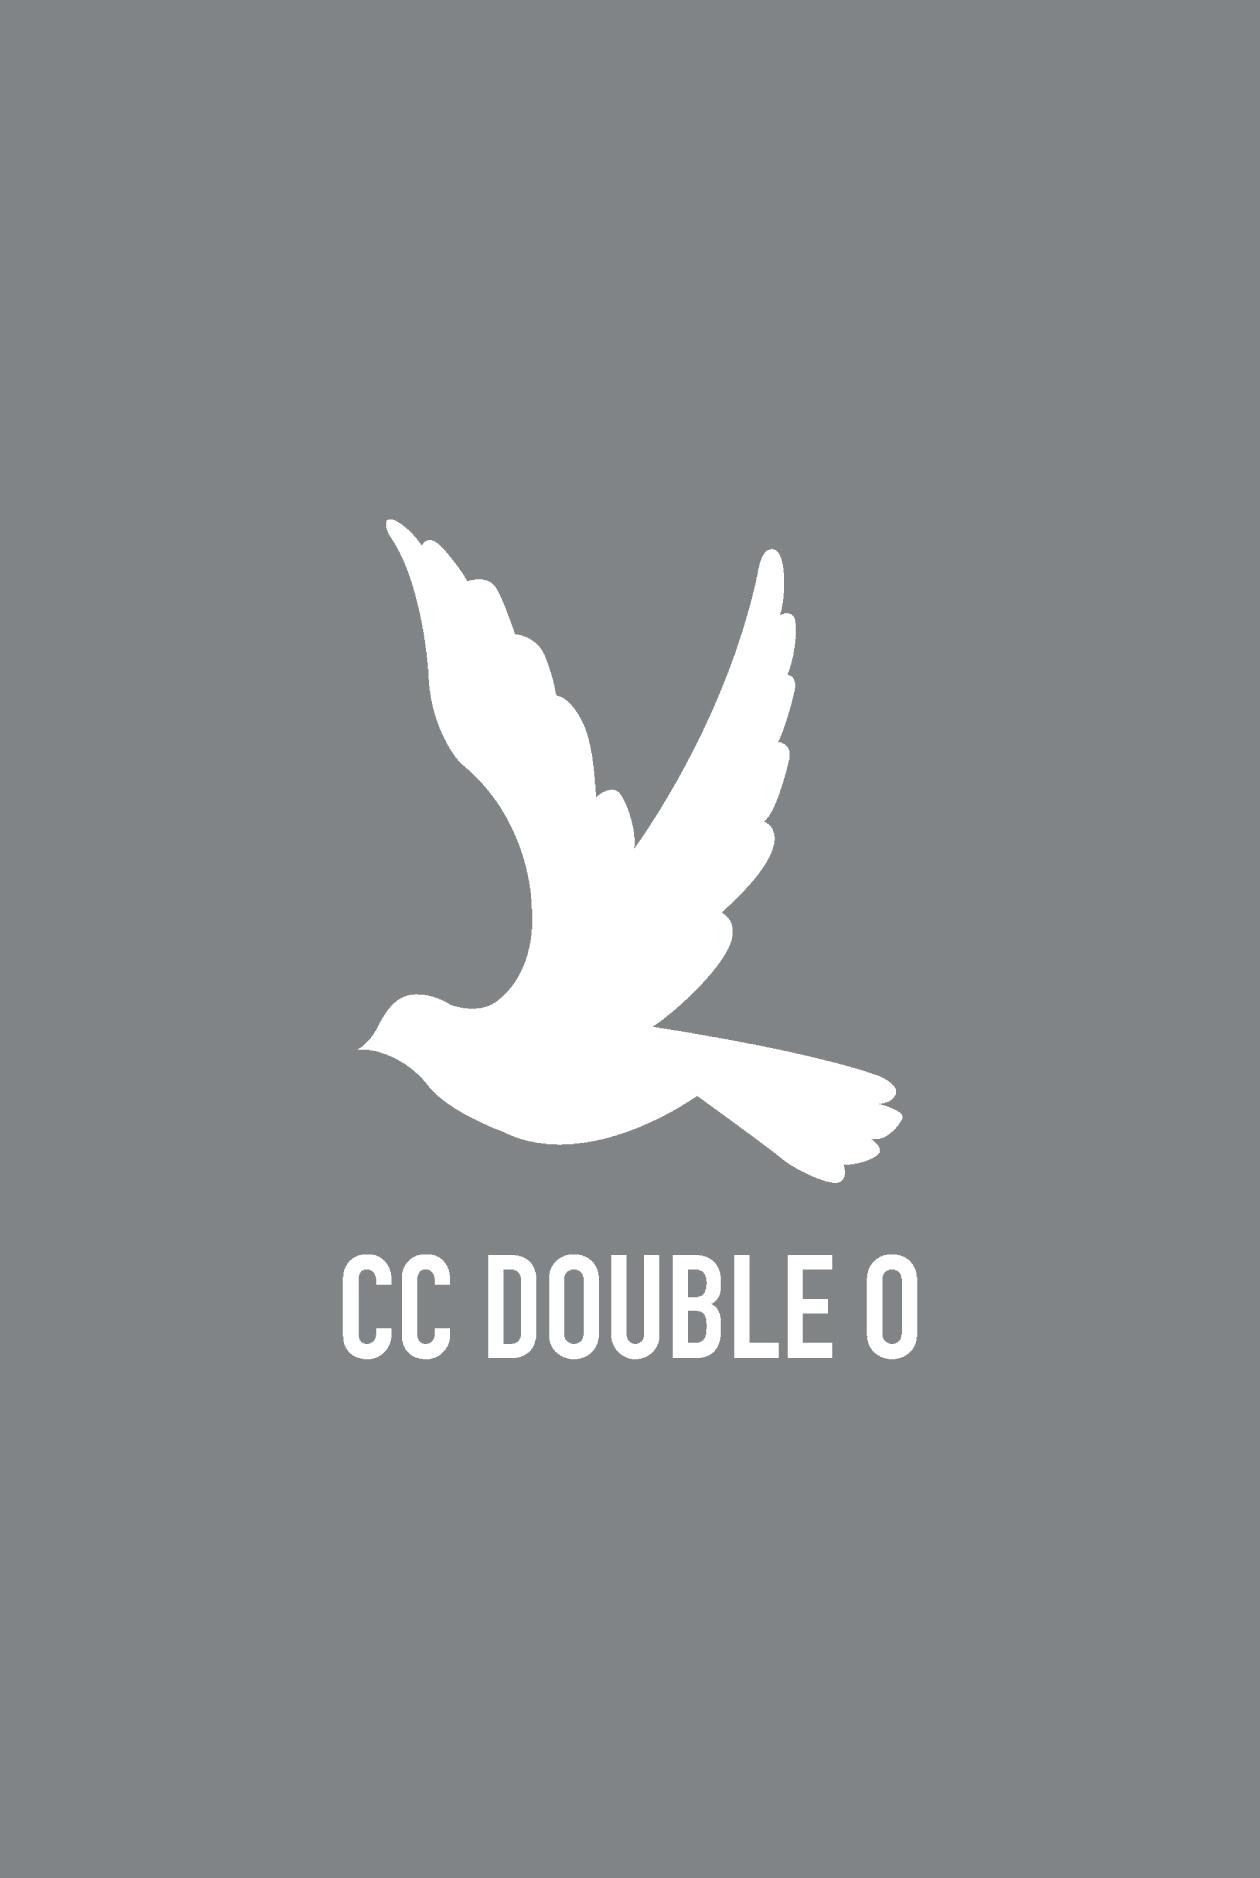 CC DOUBLE O Monogram Single-Strap Sandals